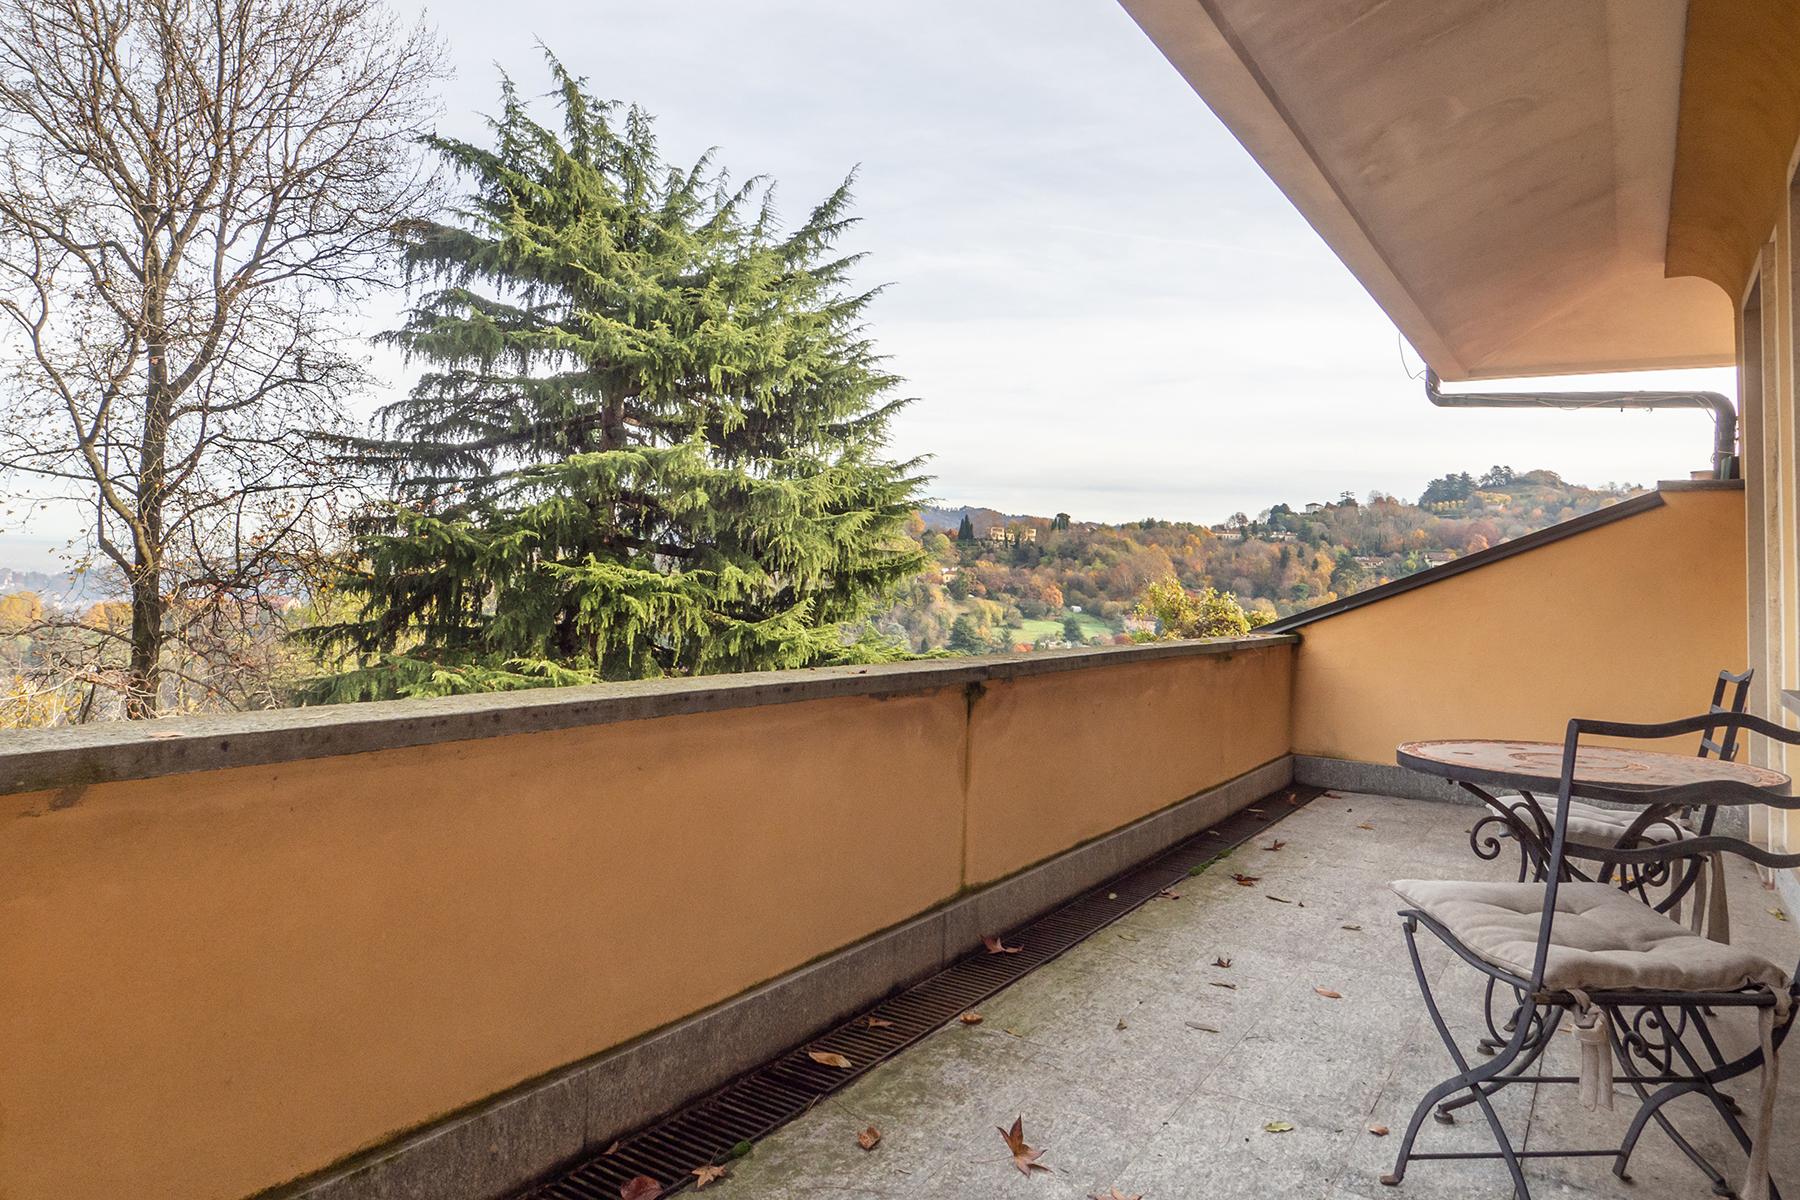 Casa indipendente in Vendita a Torino: 5 locali, 277 mq - Foto 18